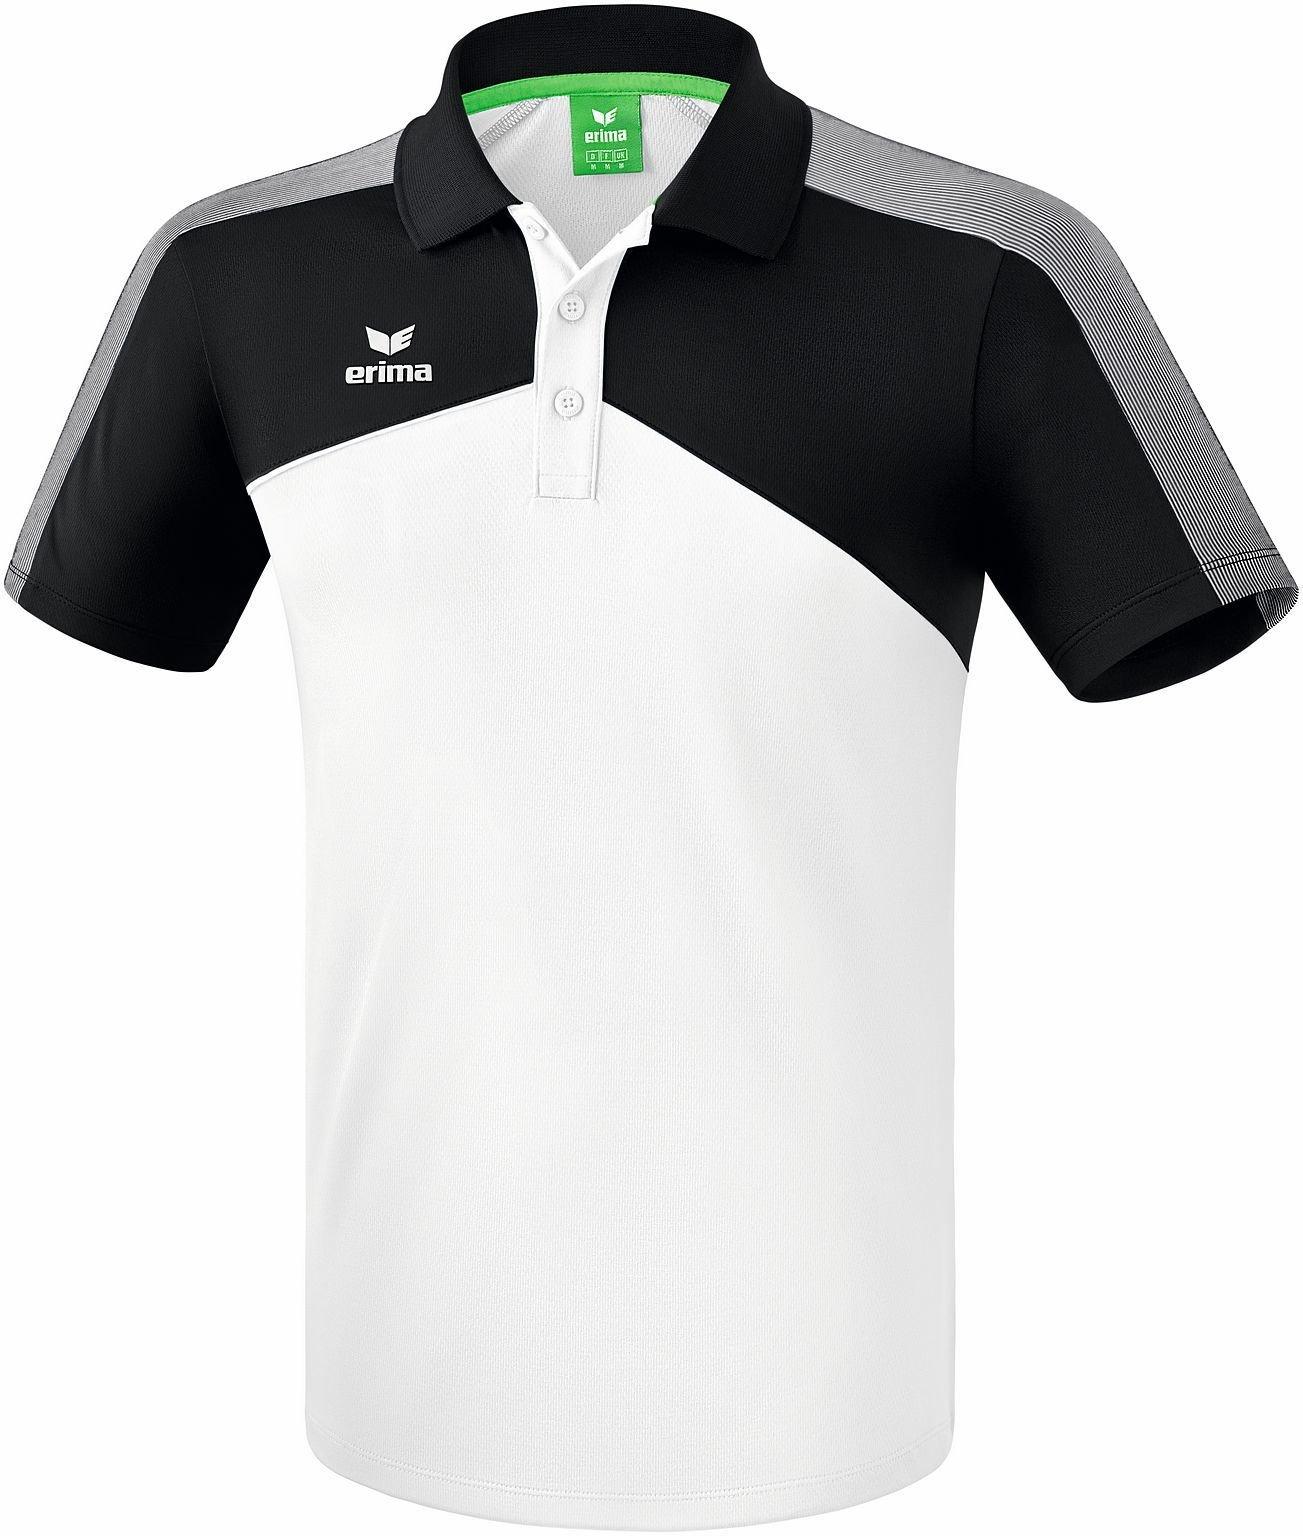 Premium One 2.0 Poloshirt Herren Kinder bhc1111803